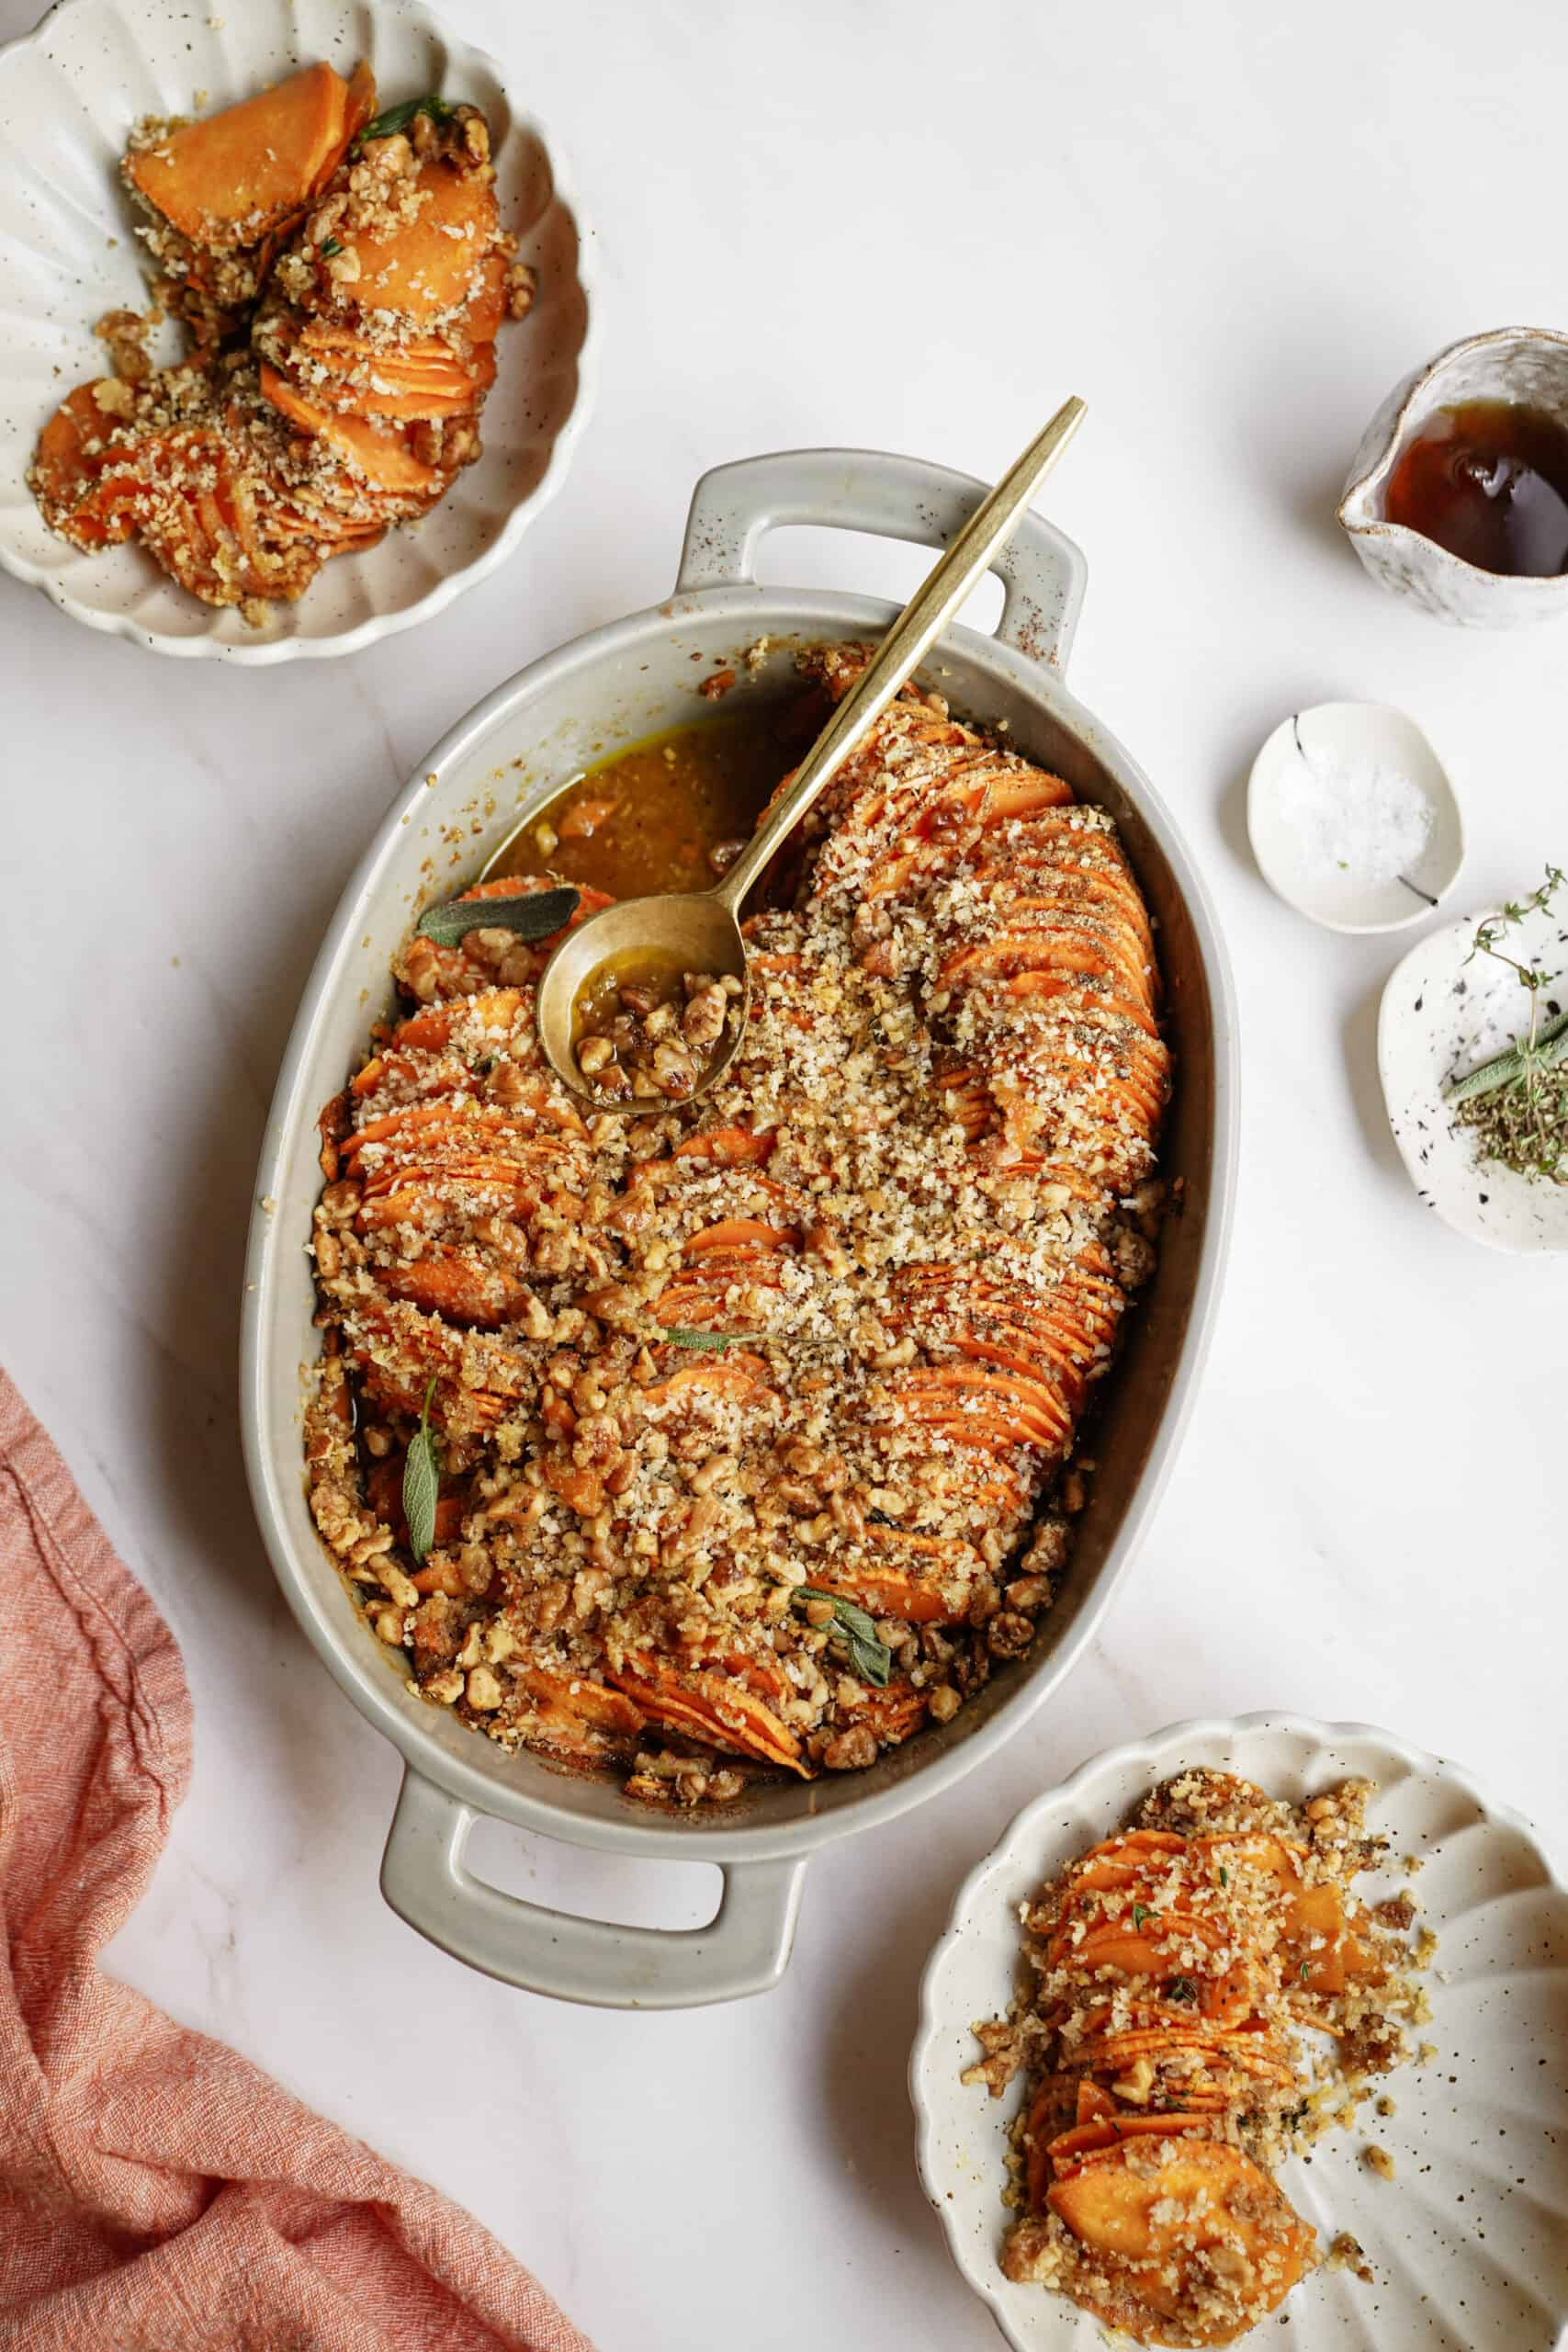 Baked Sweet Potato Recipe in a white casserole dish